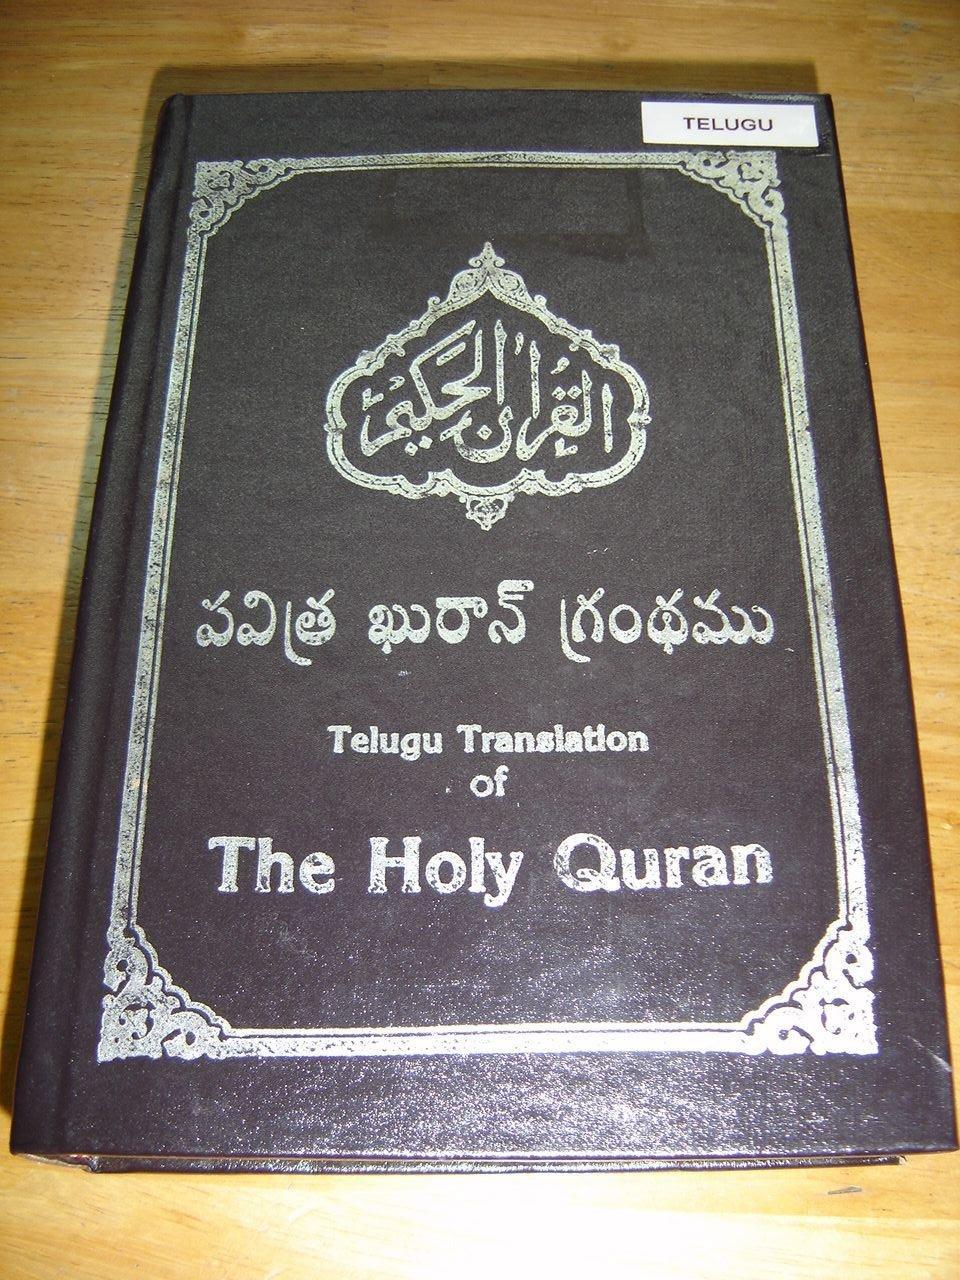 The Holy Quran: Telugu Translation with Arabic Text, Black